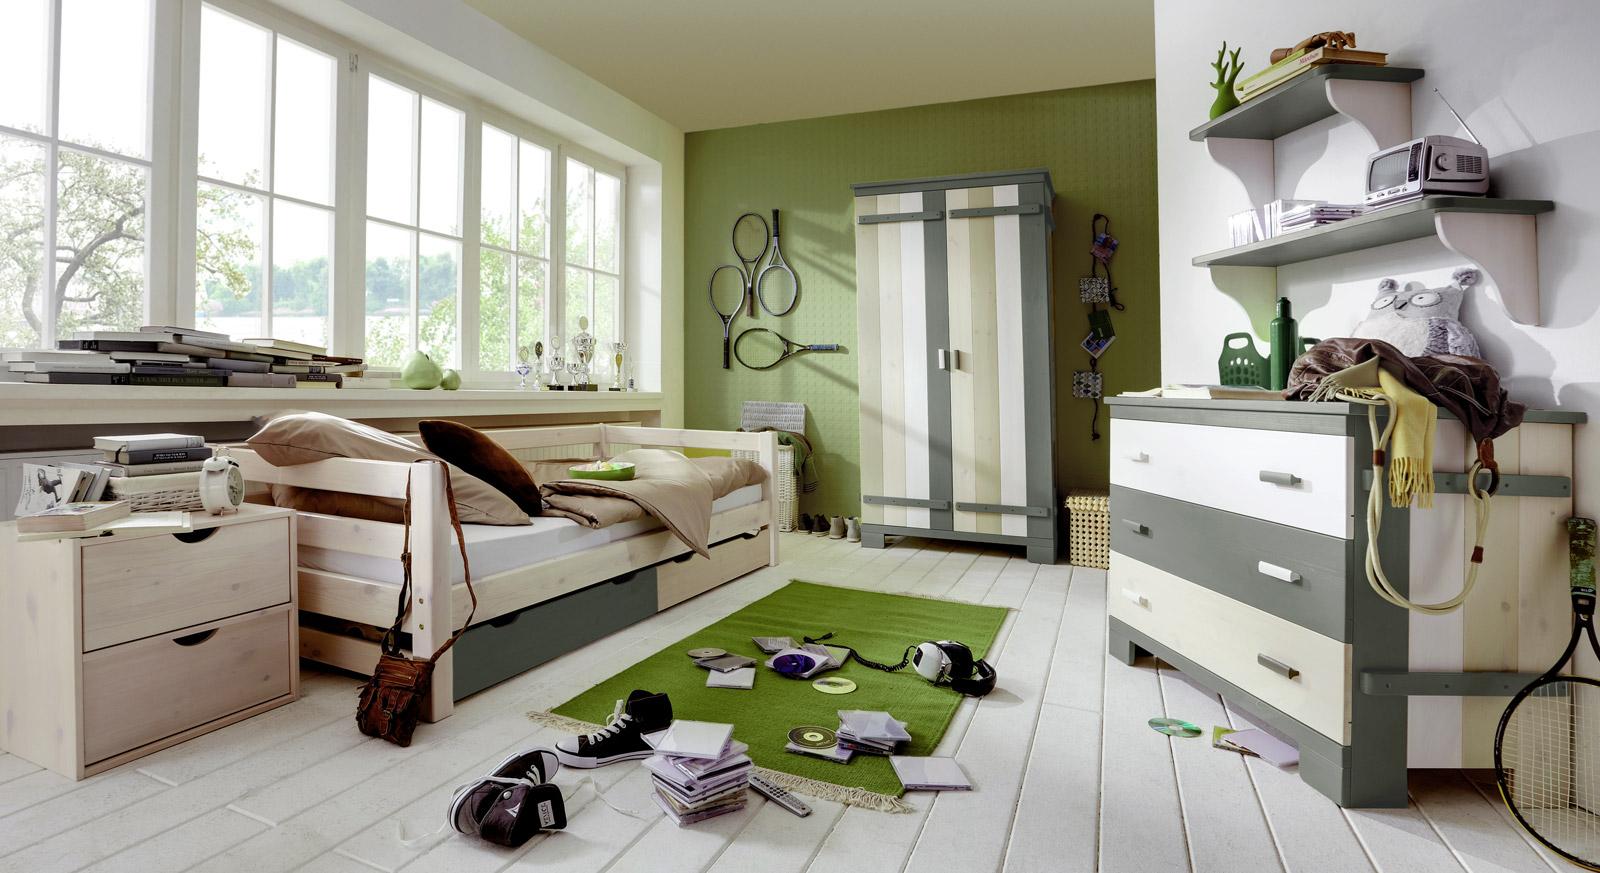 Laubhütte Zimmer